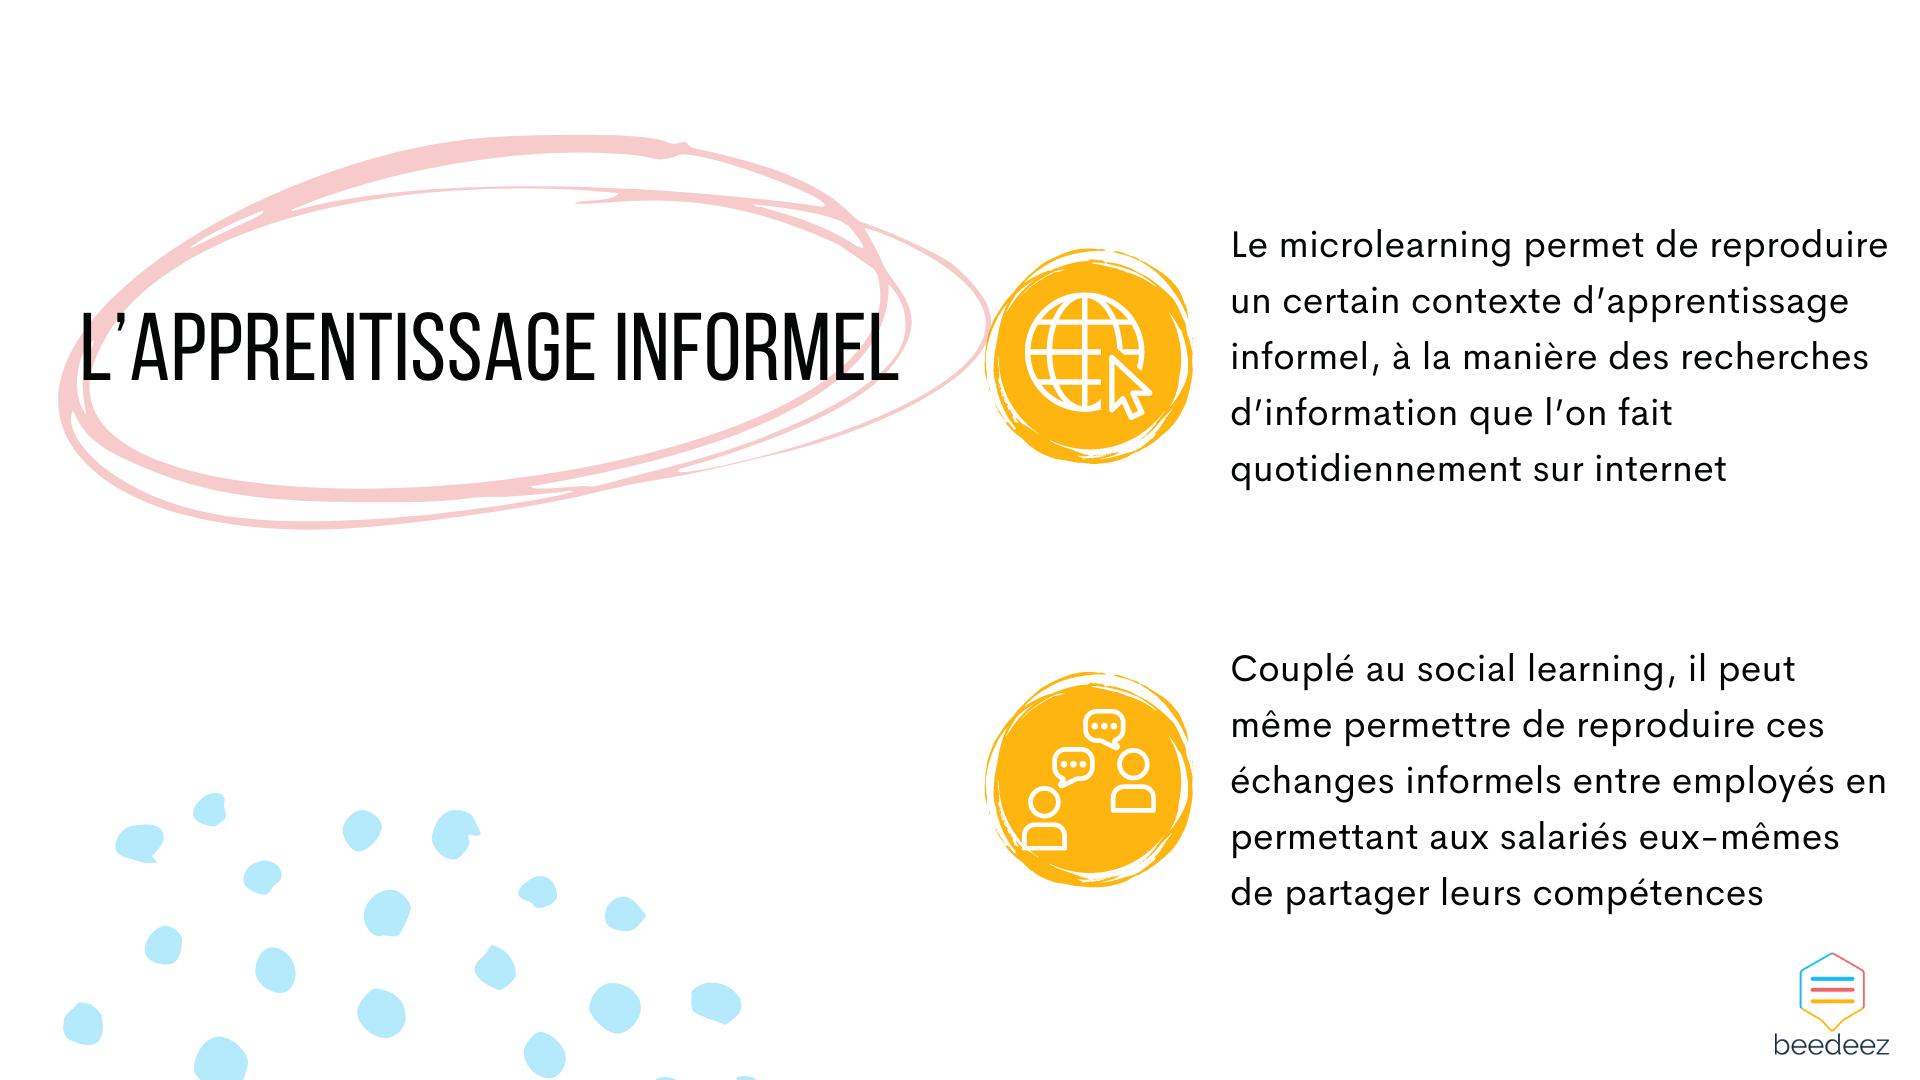 L'apprentissage informel